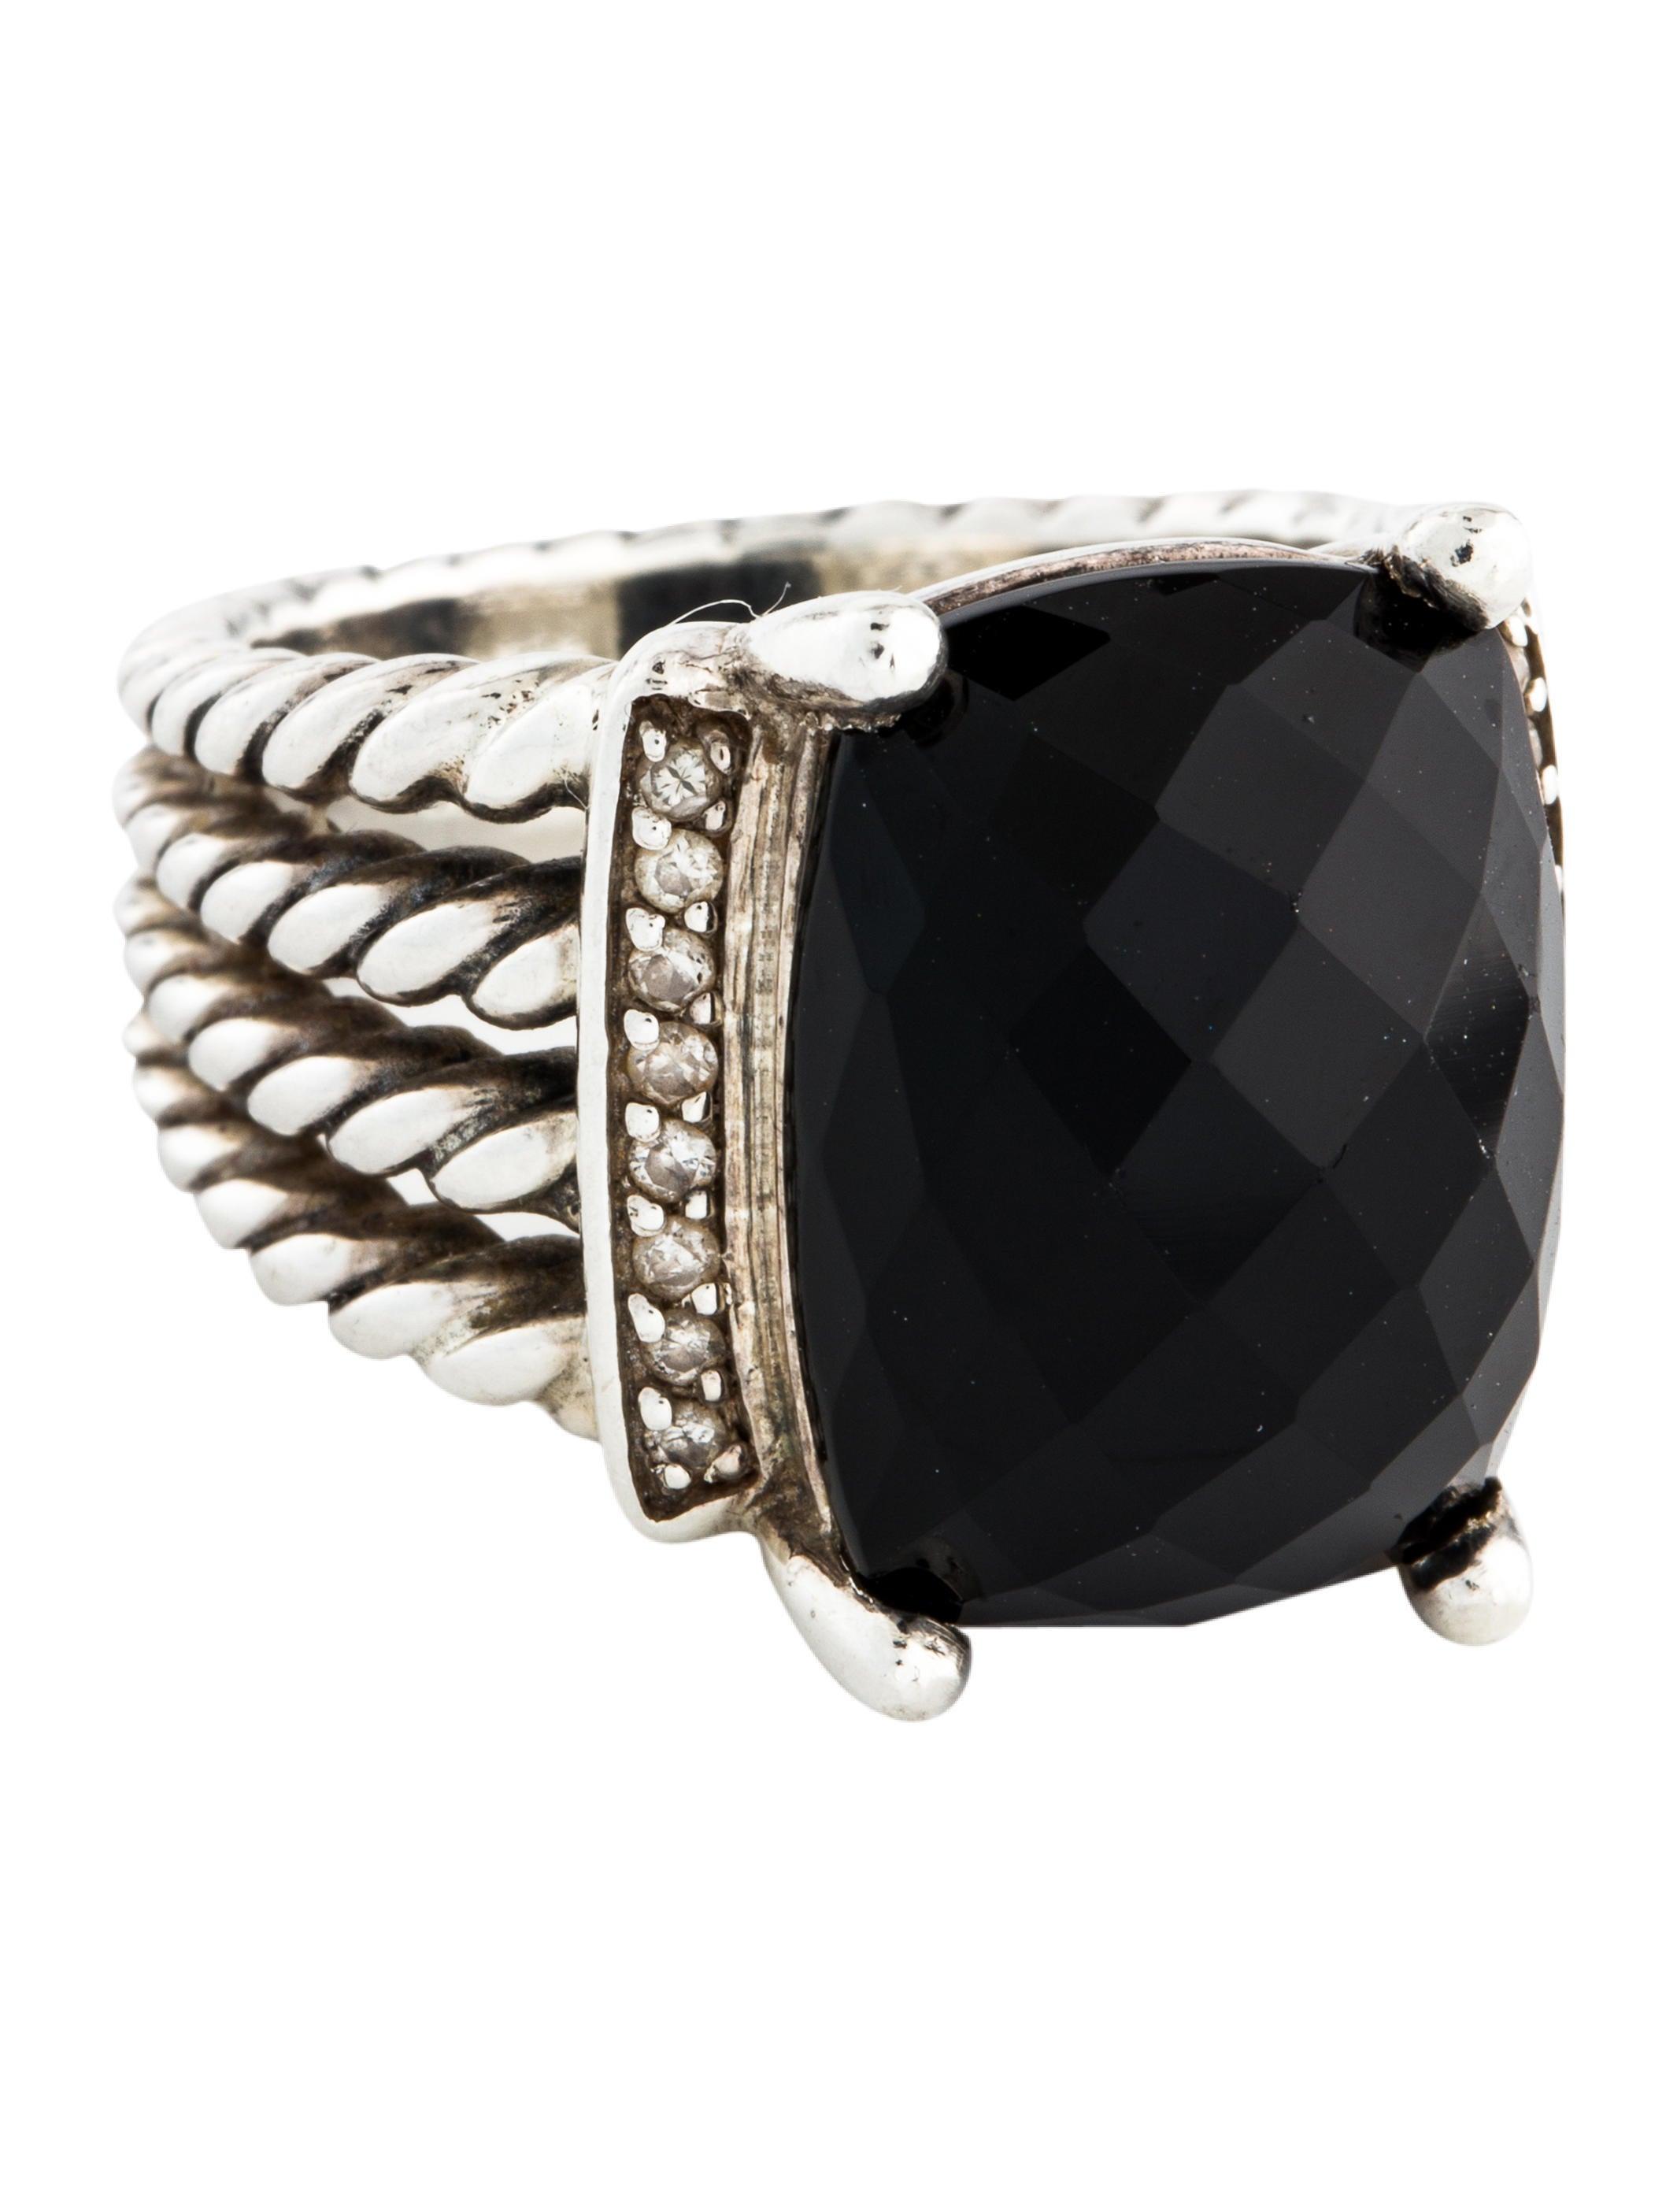 cc384dc7314a7 David Yurman Onyx   Diamond Wheaton Ring - Rings - DVY48860